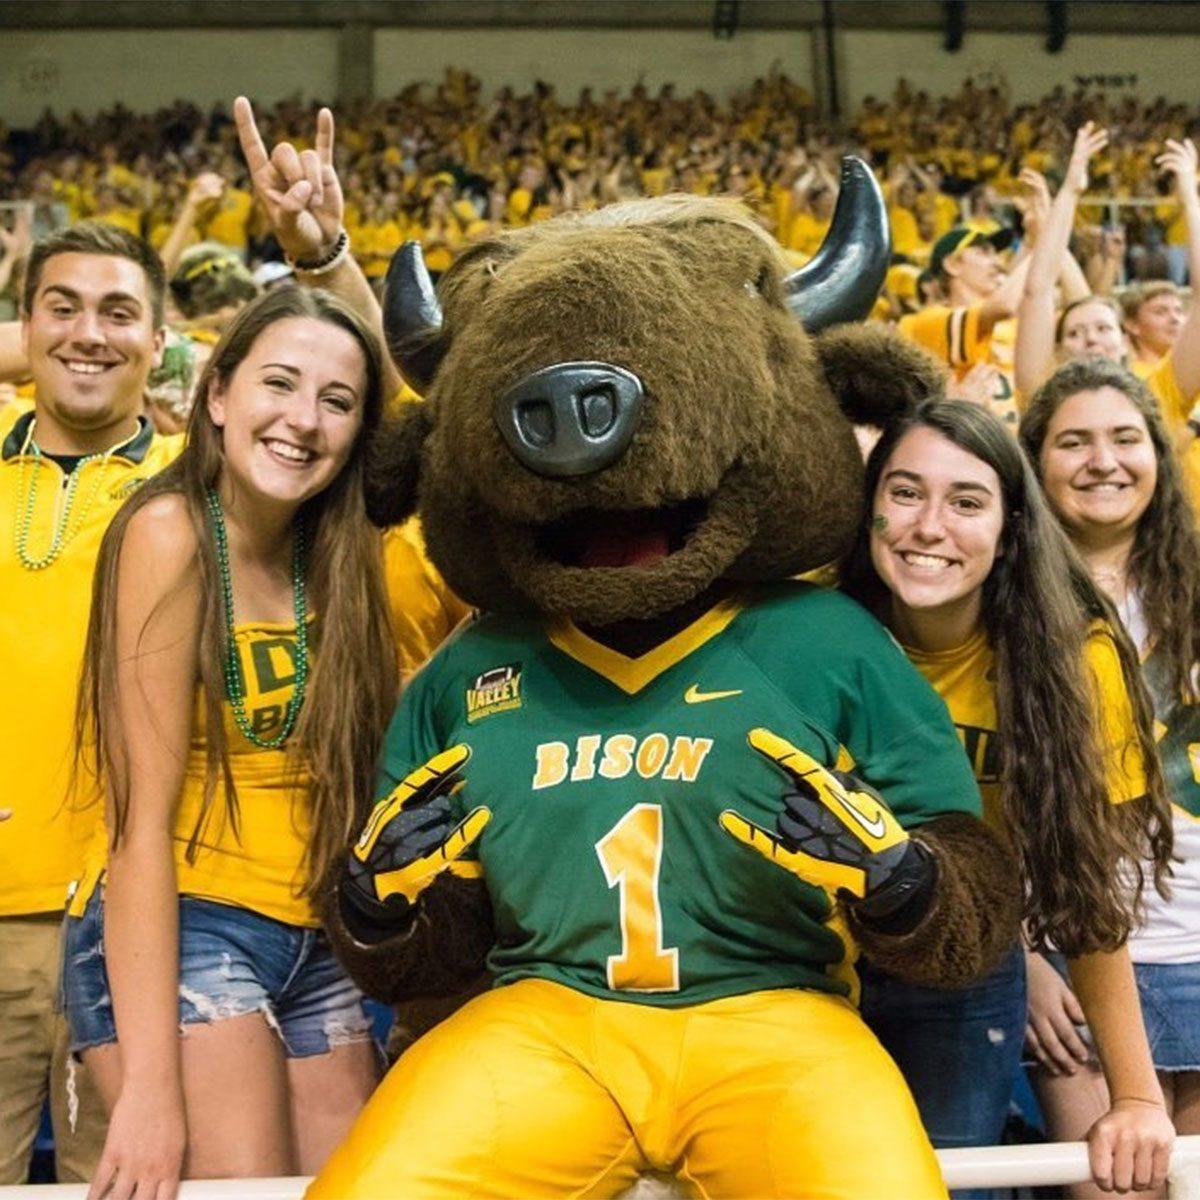 North Dakota State fans posing with mascot